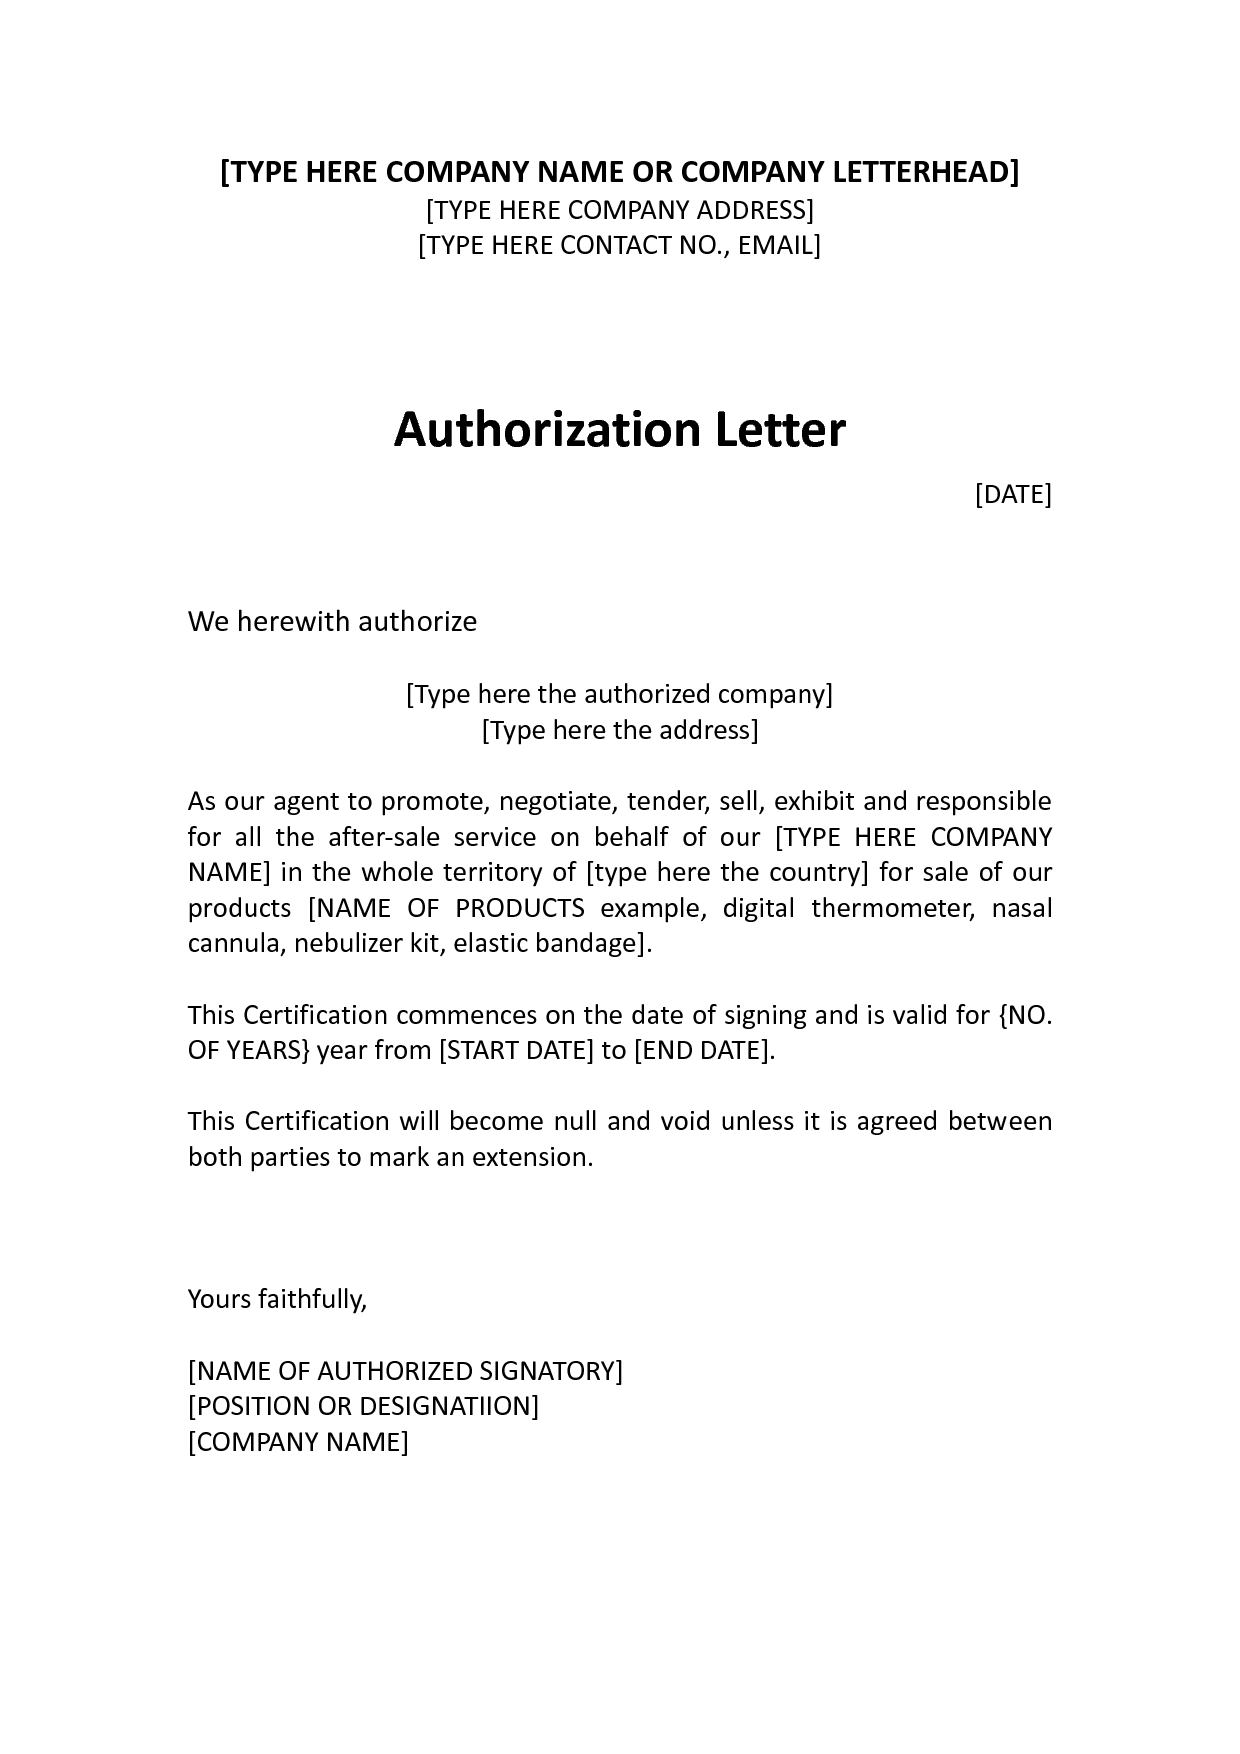 Letter Of Transmittal Template Construction - Authorization Distributor Letter Sample Distributor Dealer